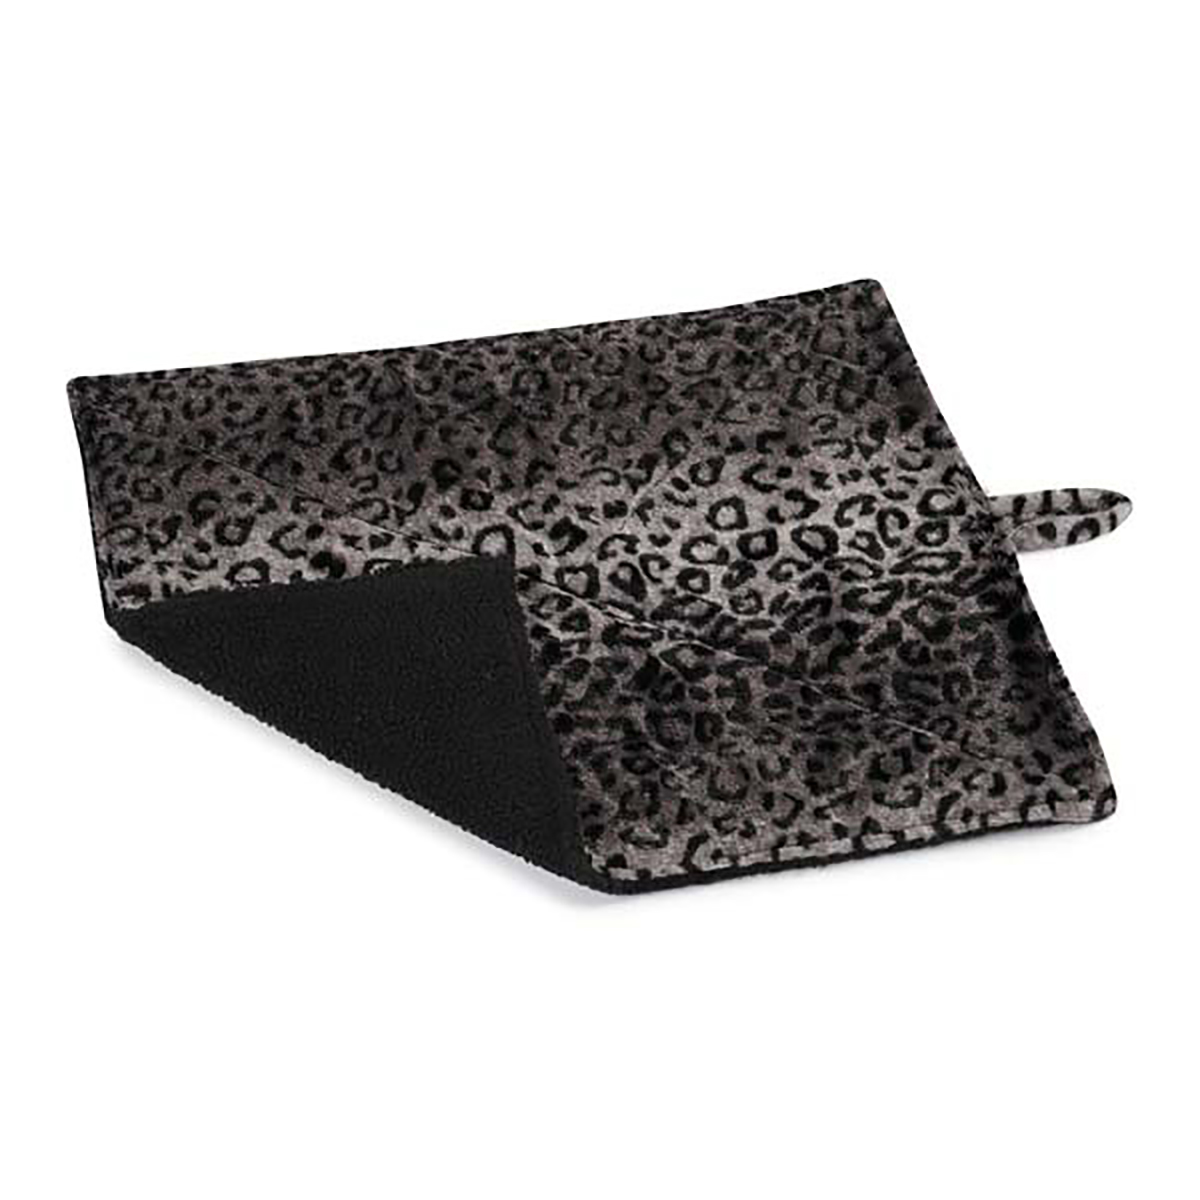 Meow Town ThermaPet Cat Mat - Gray Leopard